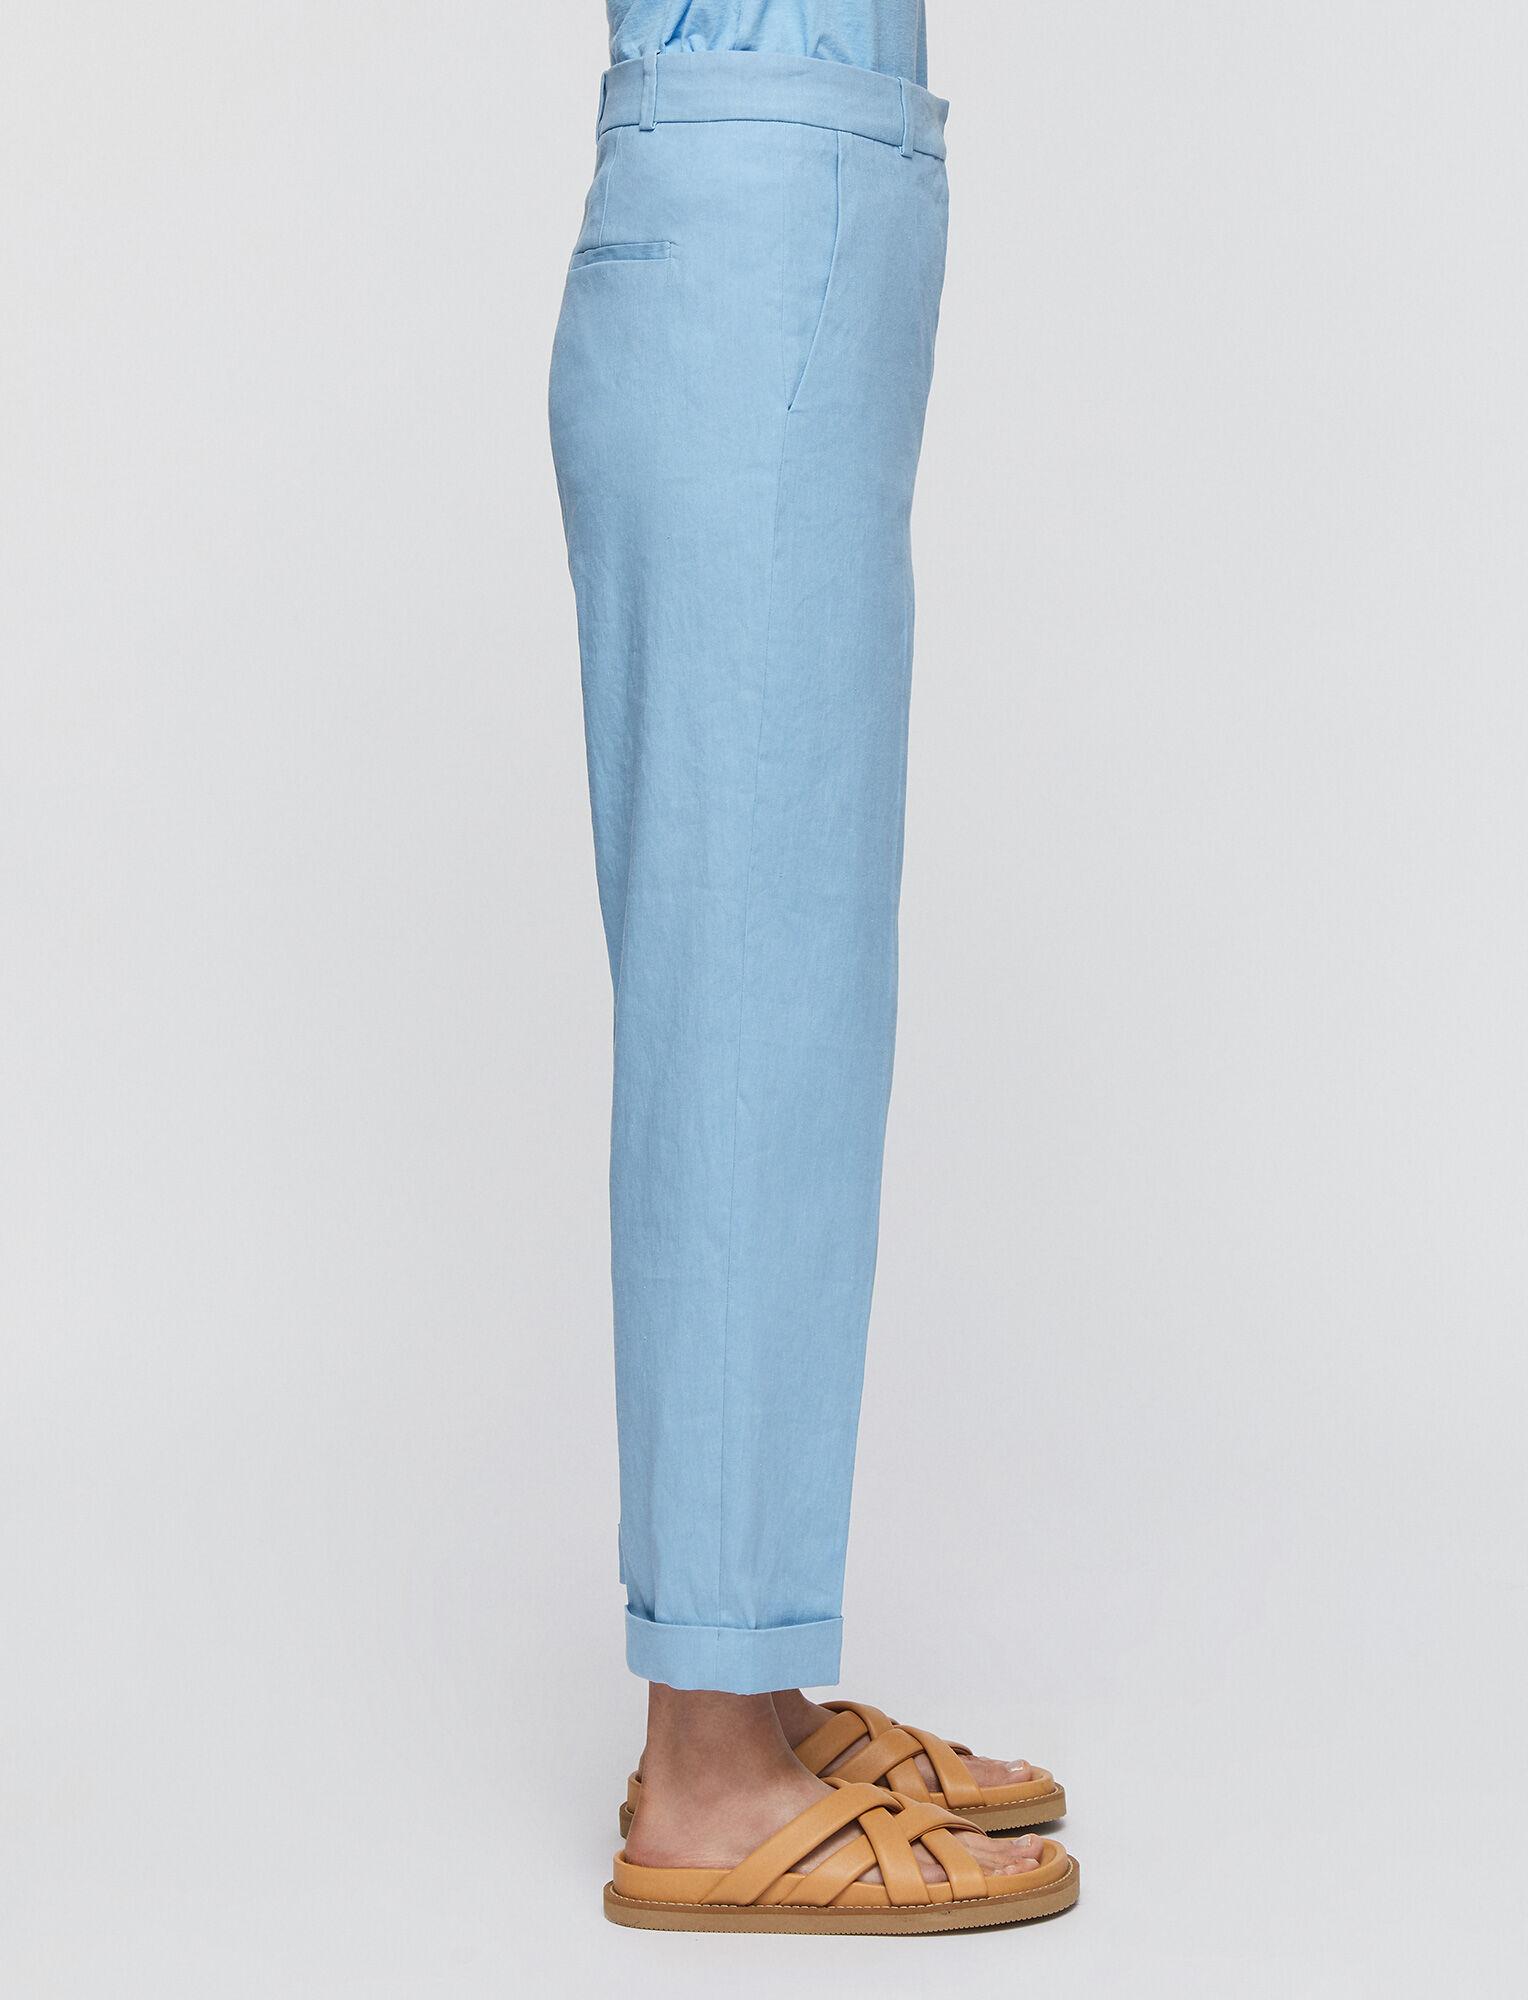 Joseph, Stretch Linen Cotton Trina Trousers, in CERULEAN